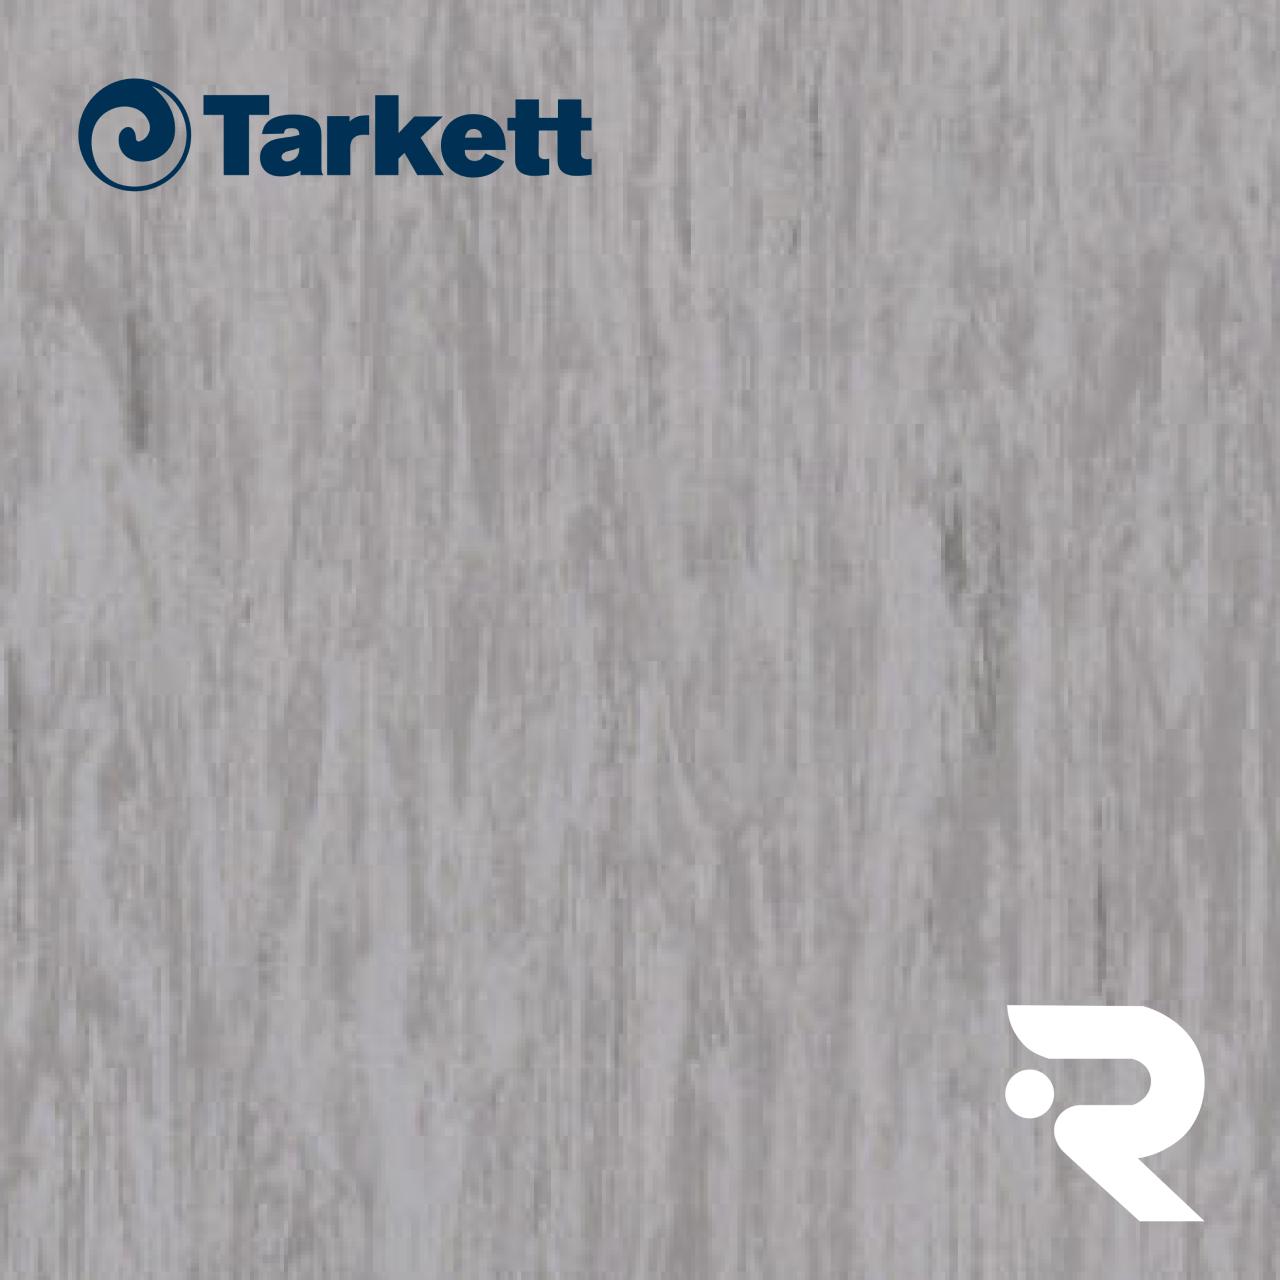 🏫 Гомогенный линолеум Tarkett   Standard BEIGE GREY 0495   Standard Plus 2.0 mm   2 х 23 м